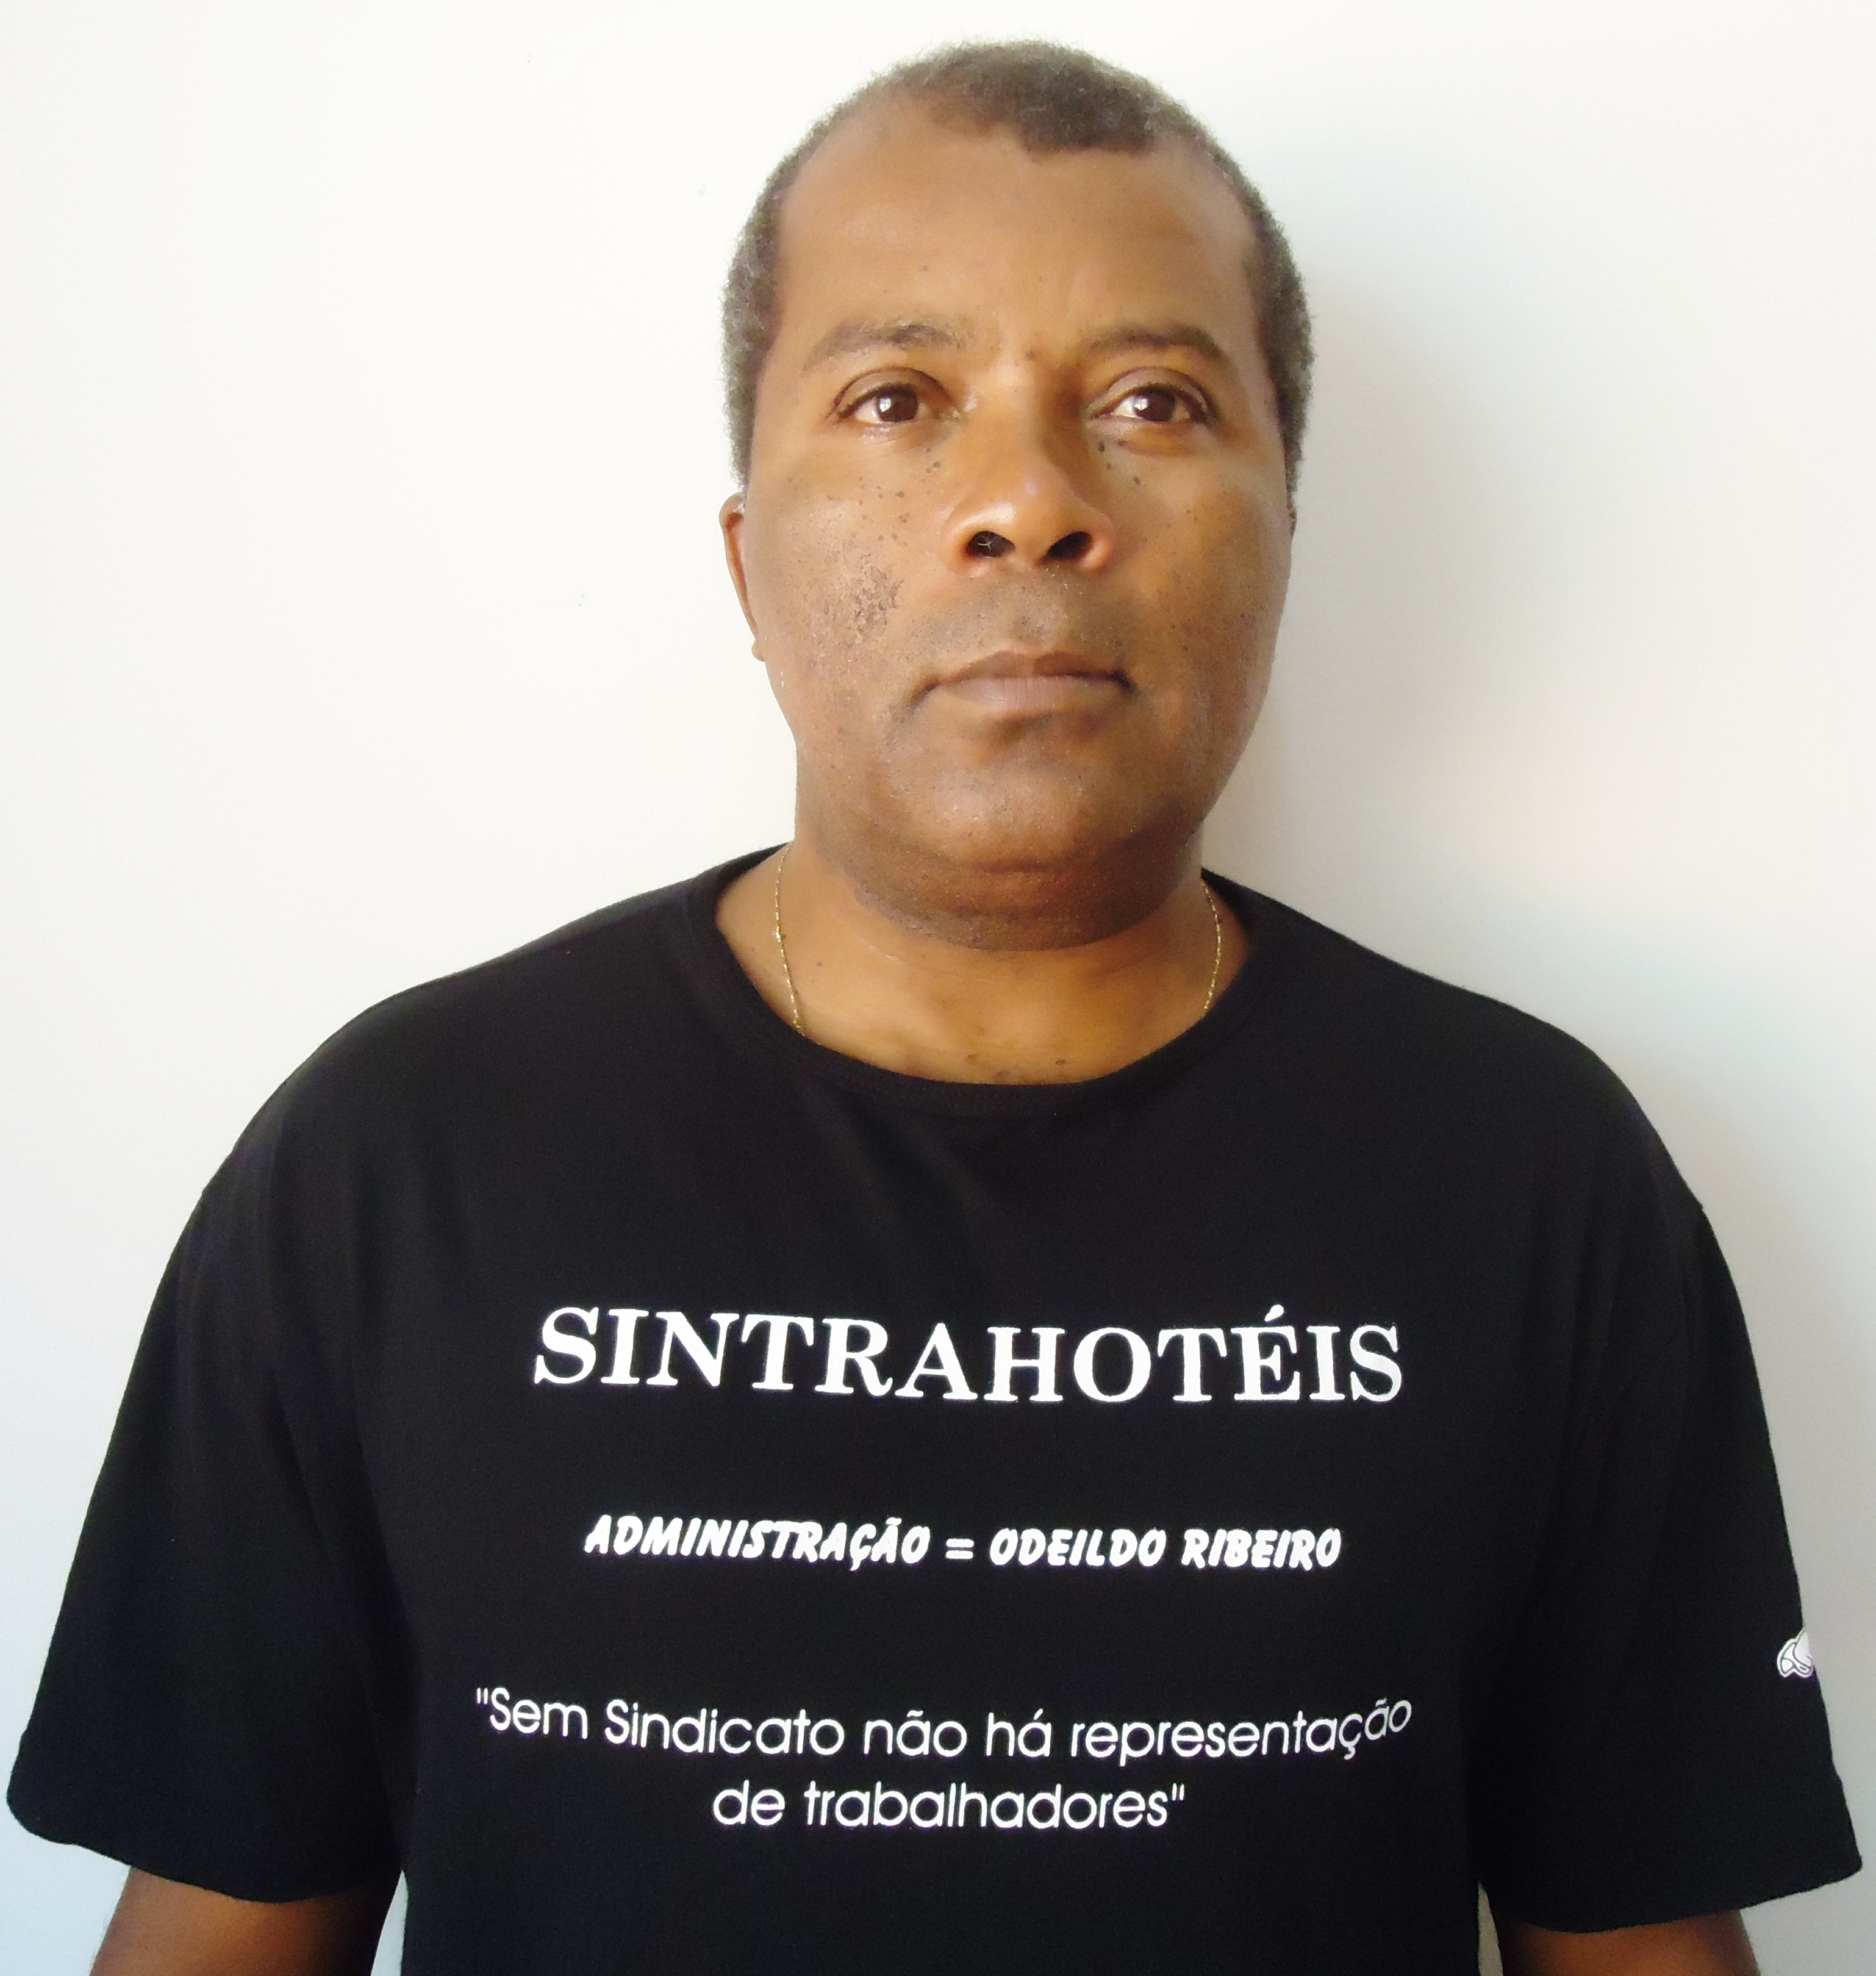 João Batista da Silva